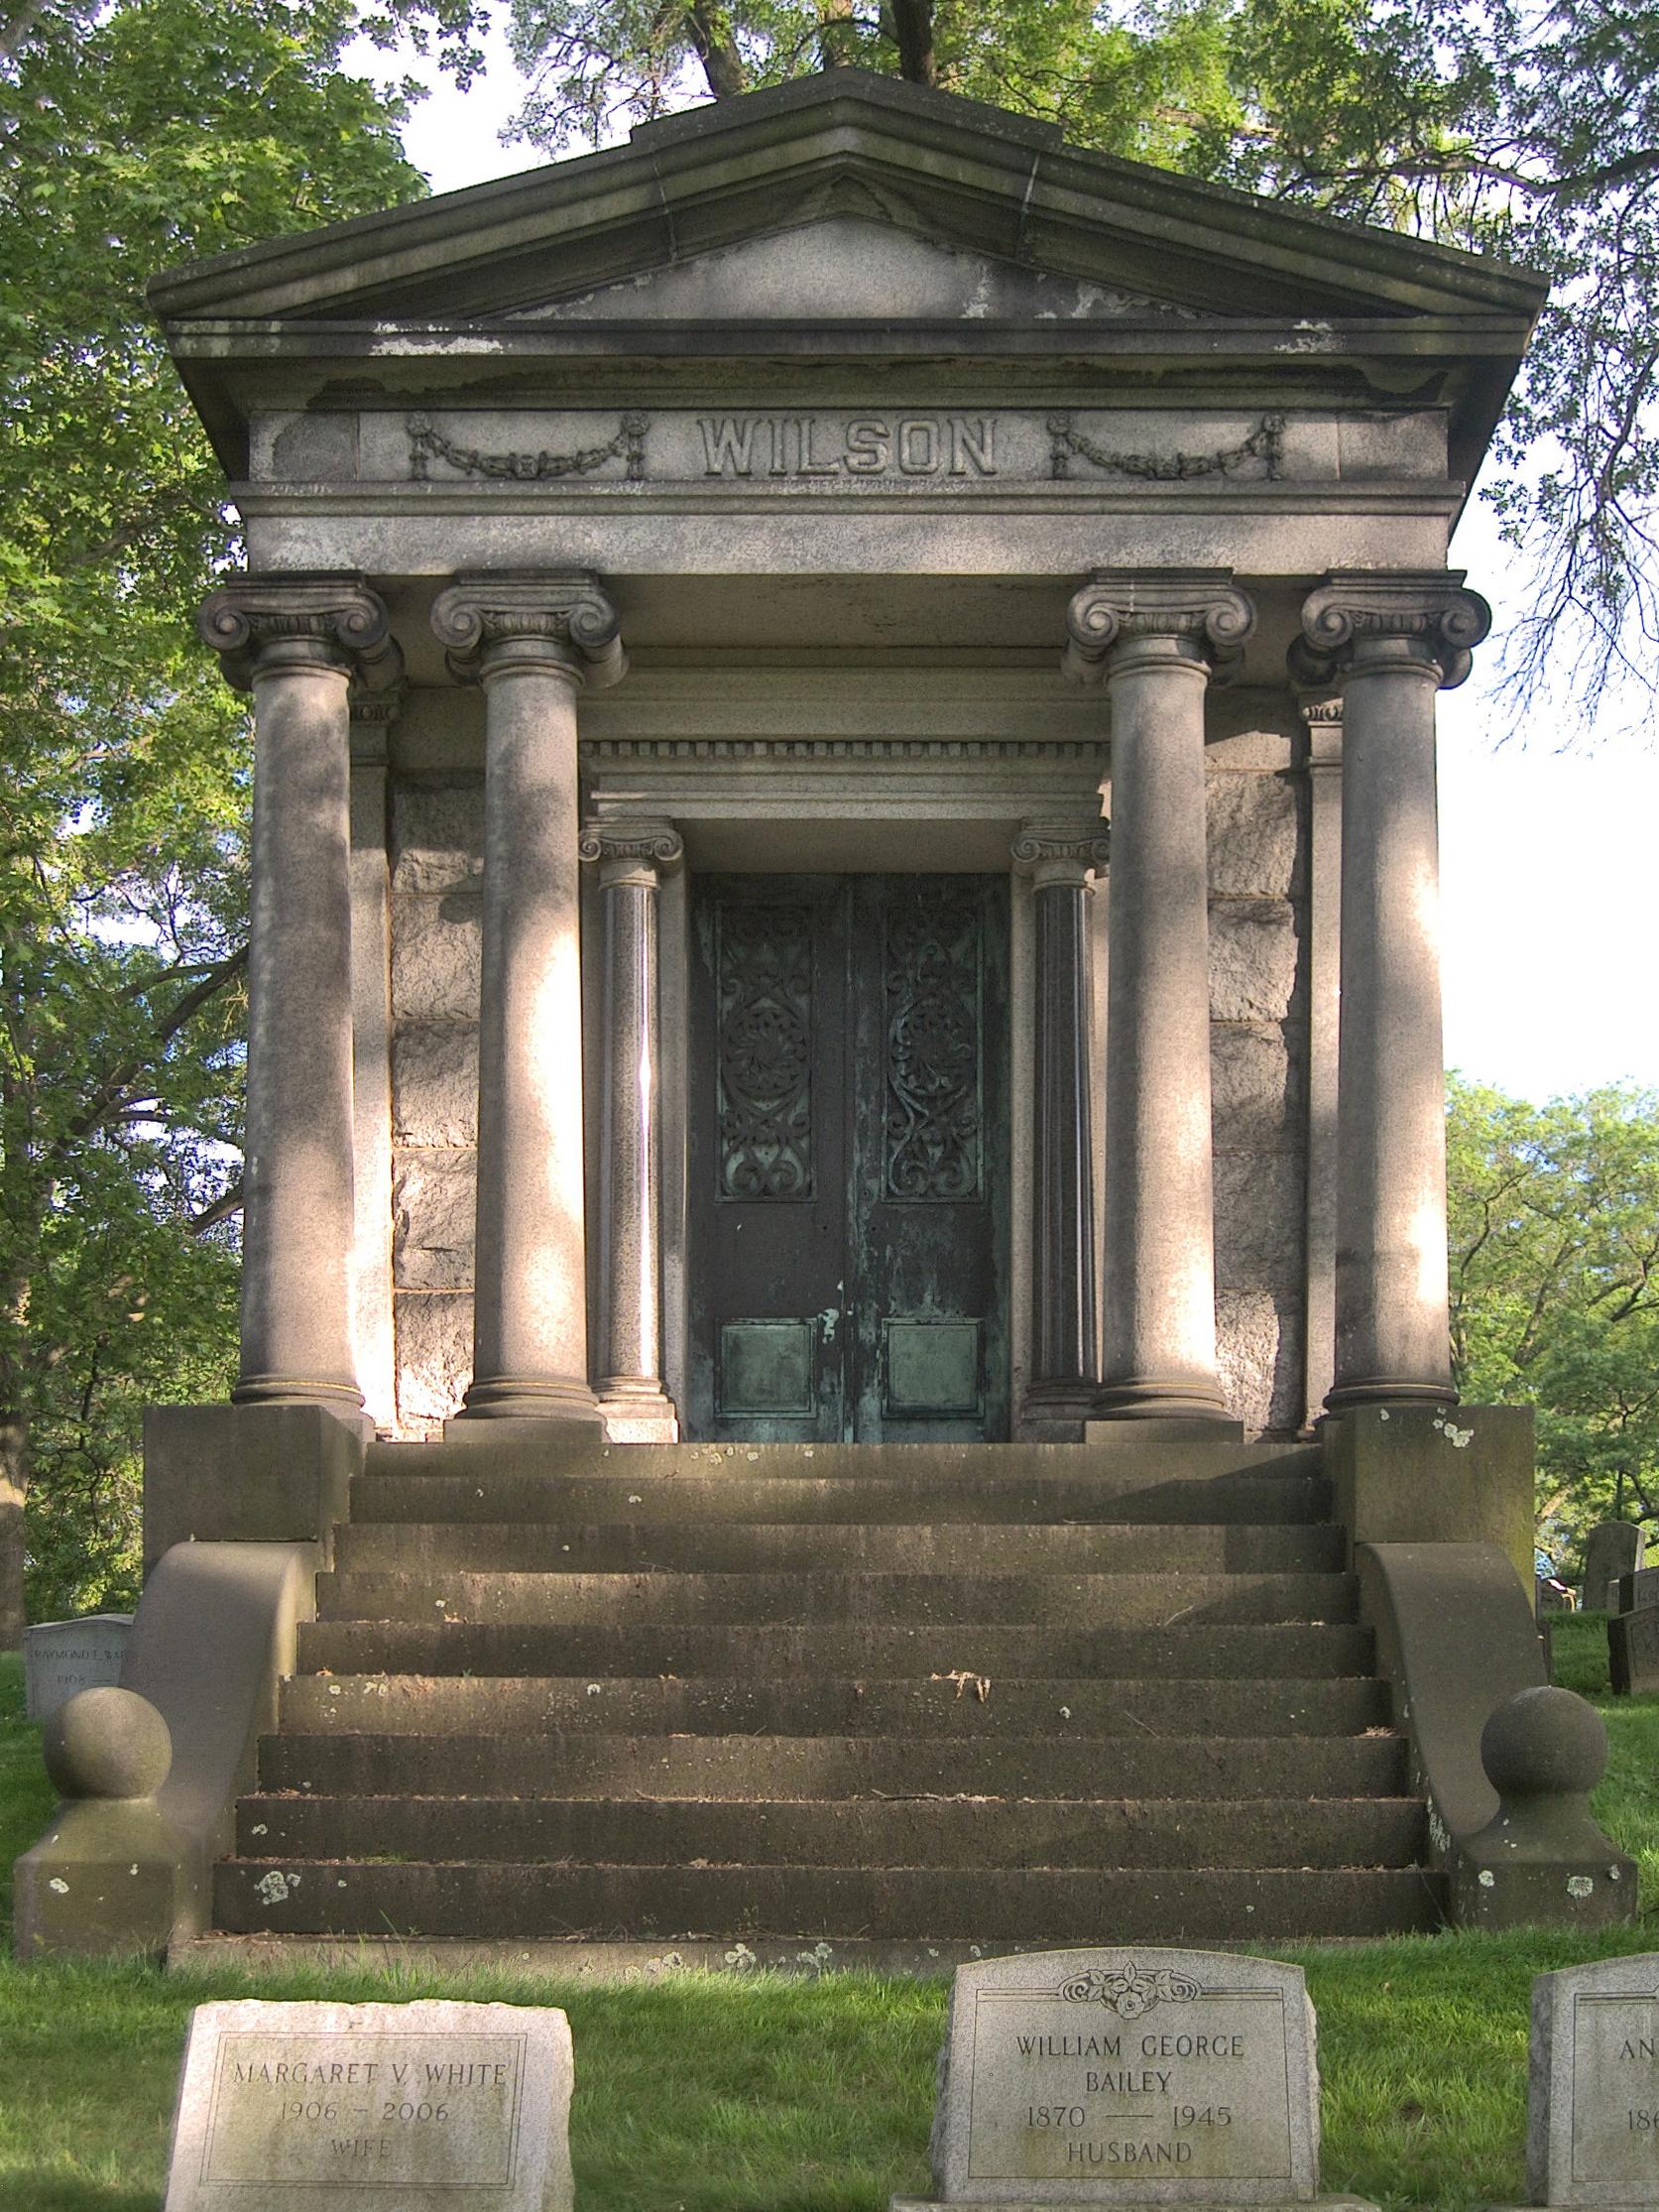 Advertisements & Wilson Mausoleum Union Dale Cemetery | Pittsburgh Cemeteries Pezcame.Com